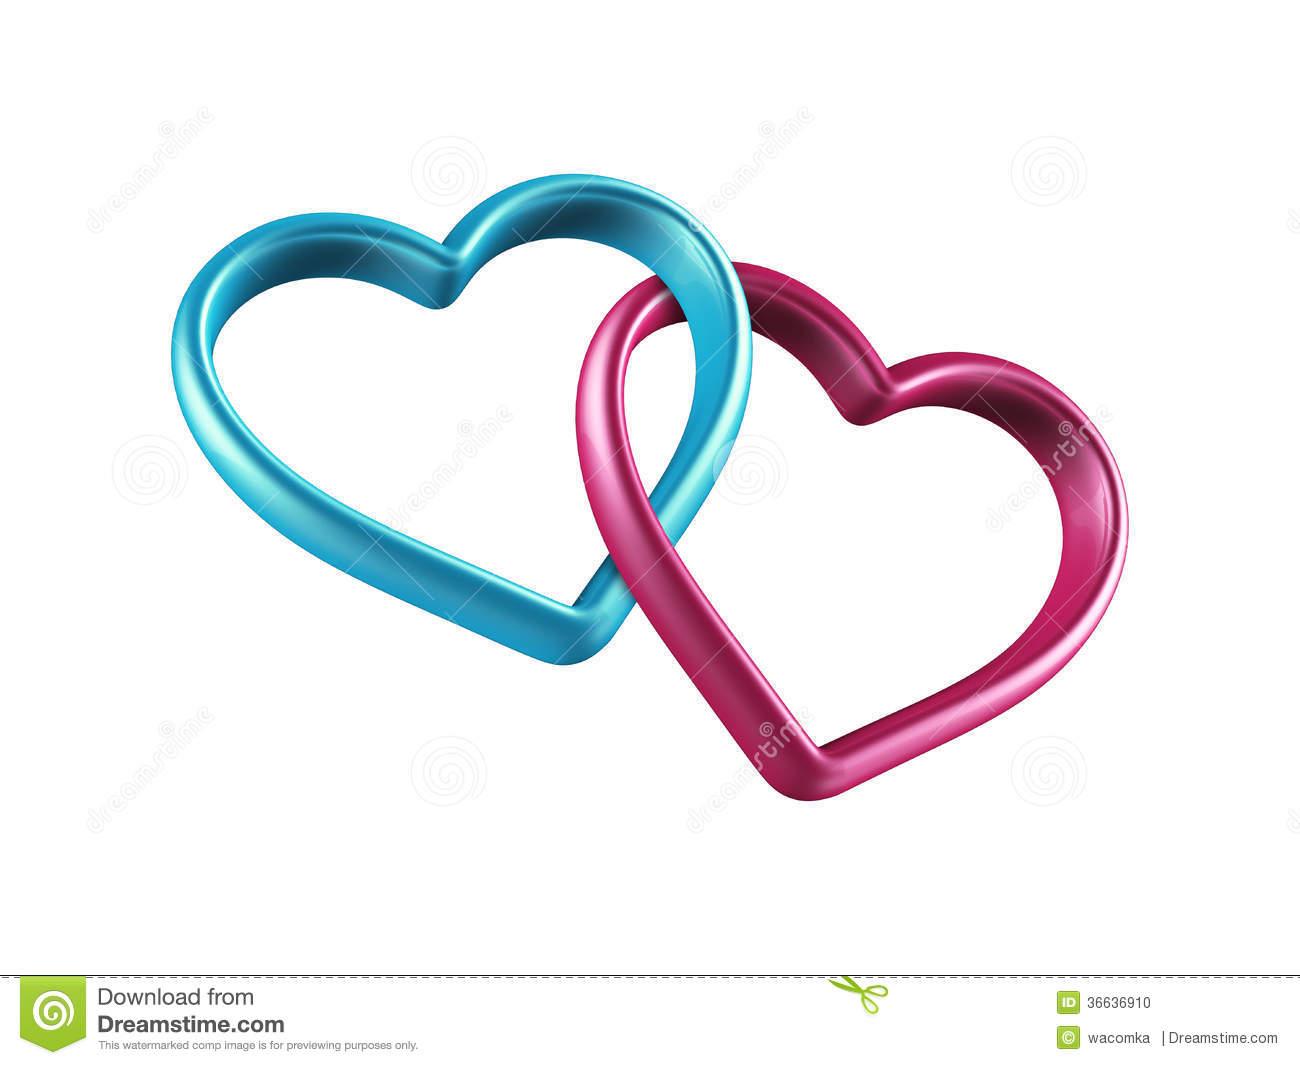 Symbols of love clipart clip freeuse Love symbol clipart 3 » Clipart Station clip freeuse